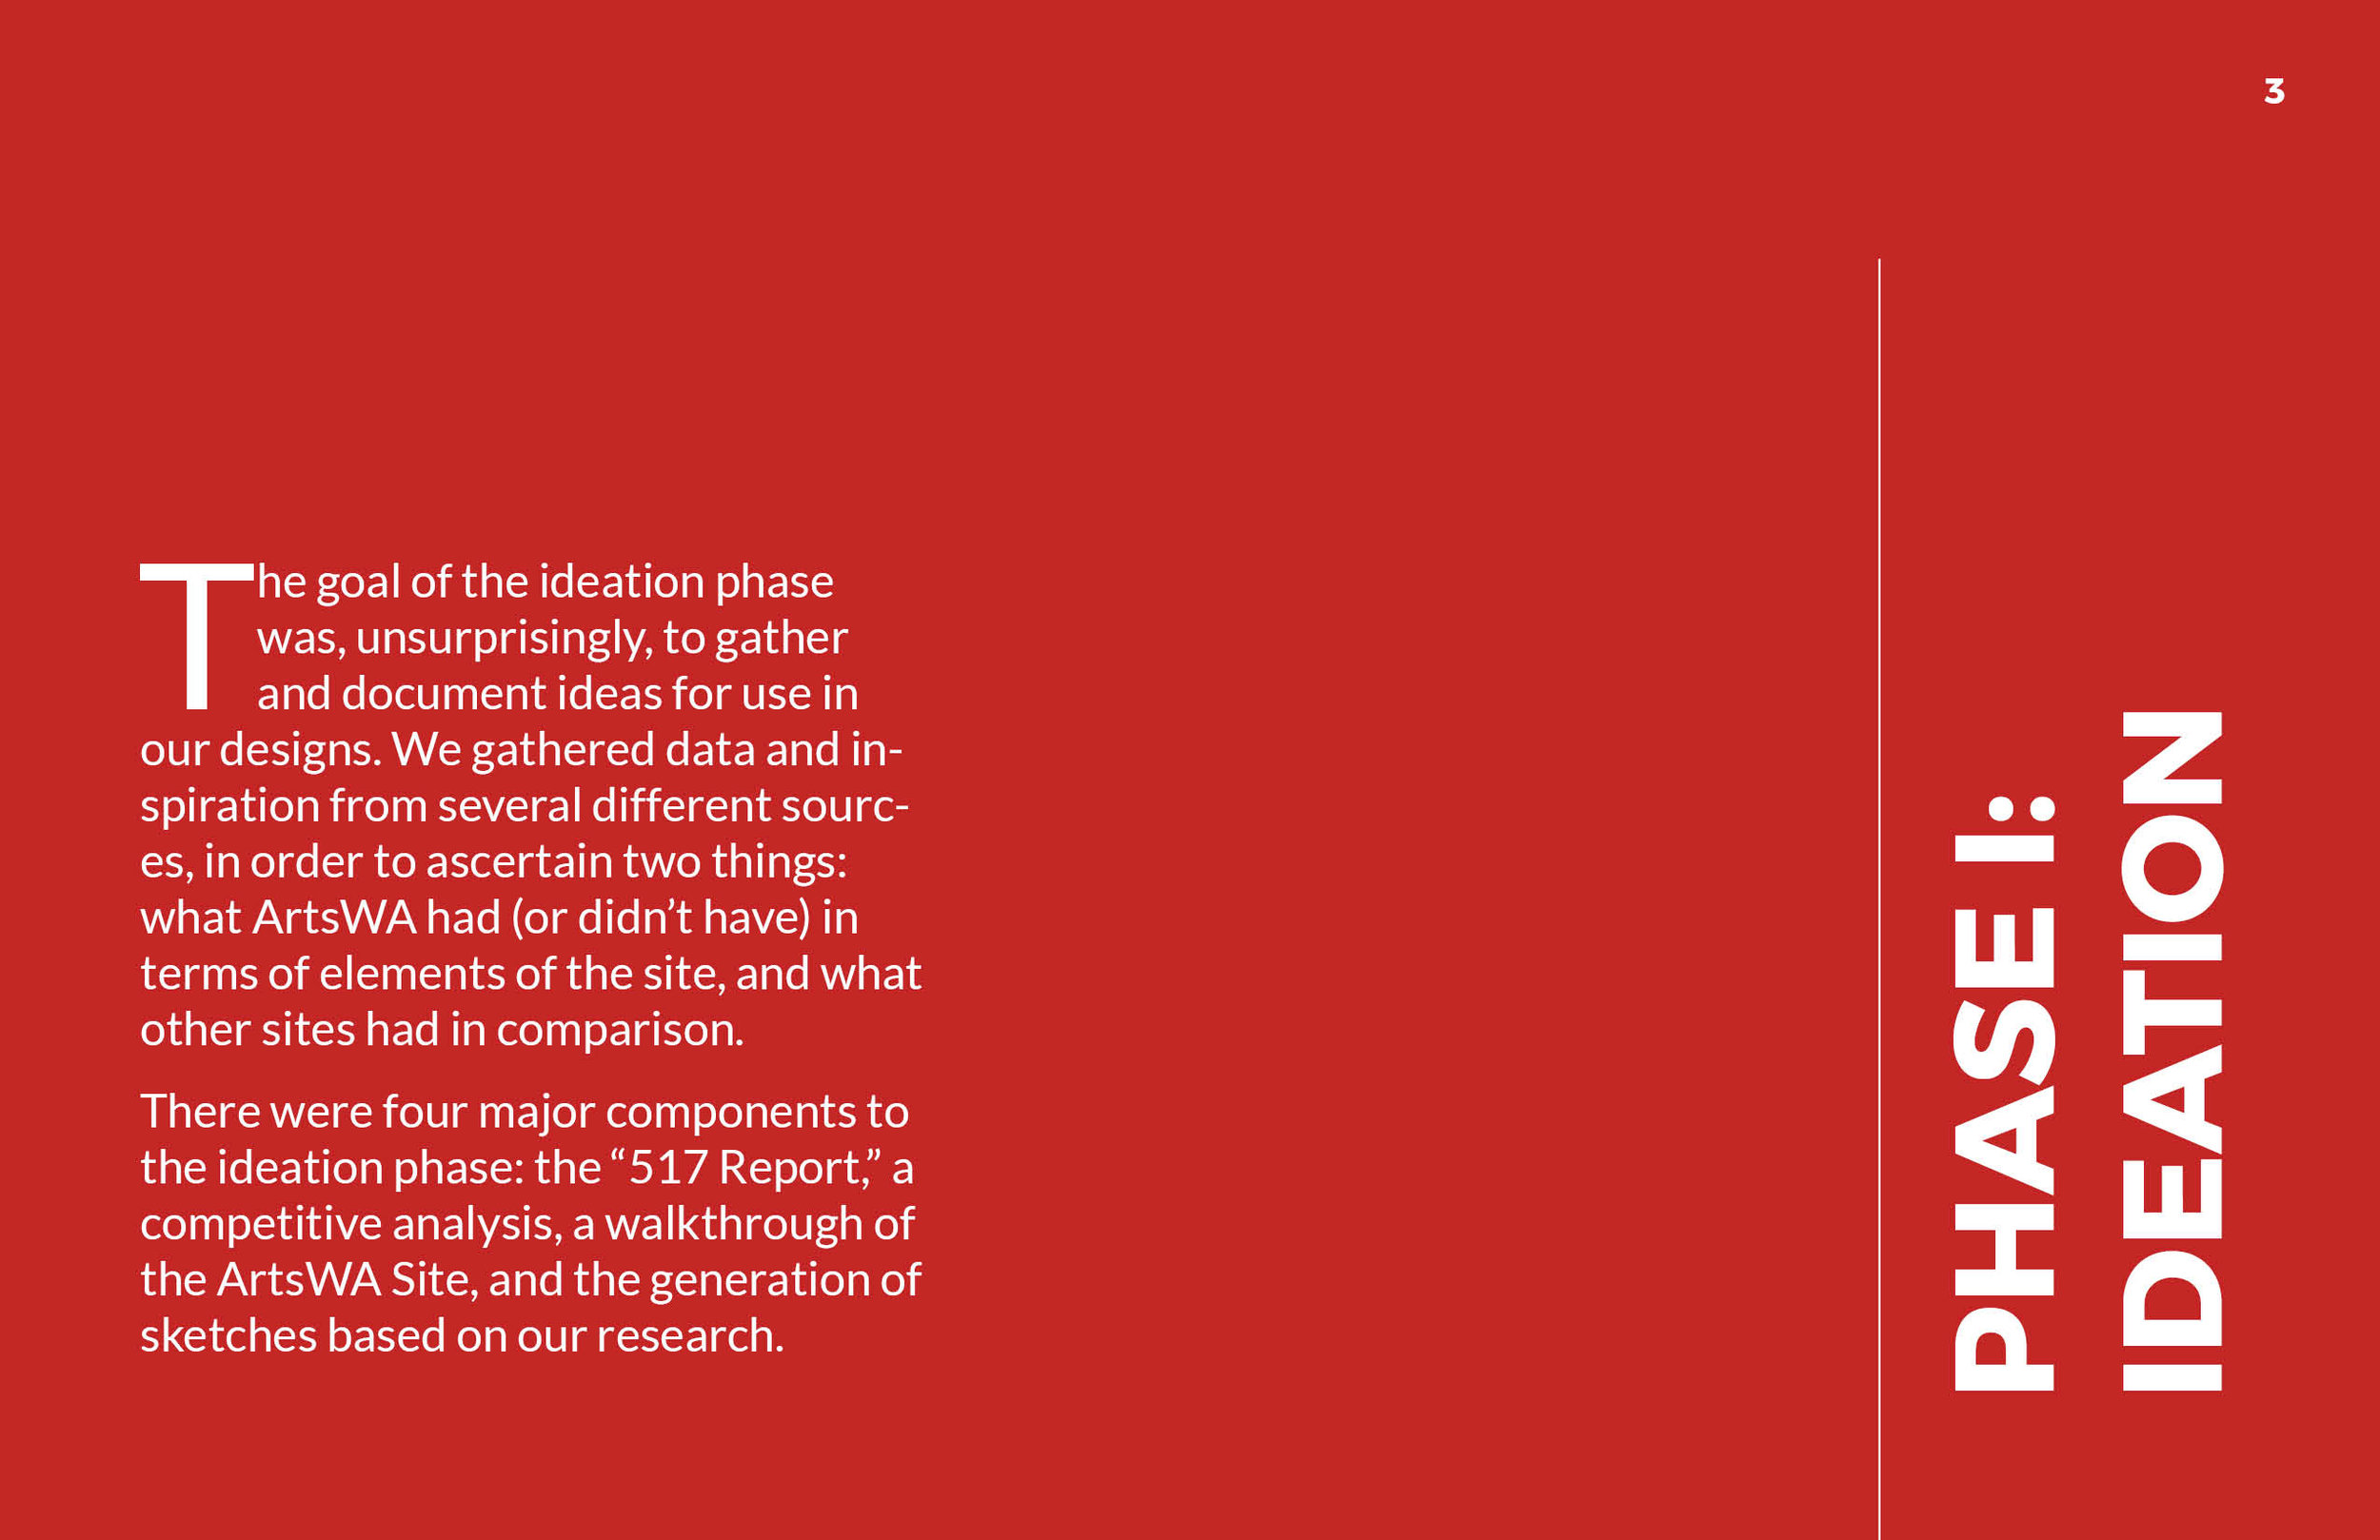 ArtsWA My Public Art Portal Process Book Phase 1: Ideation Page 1